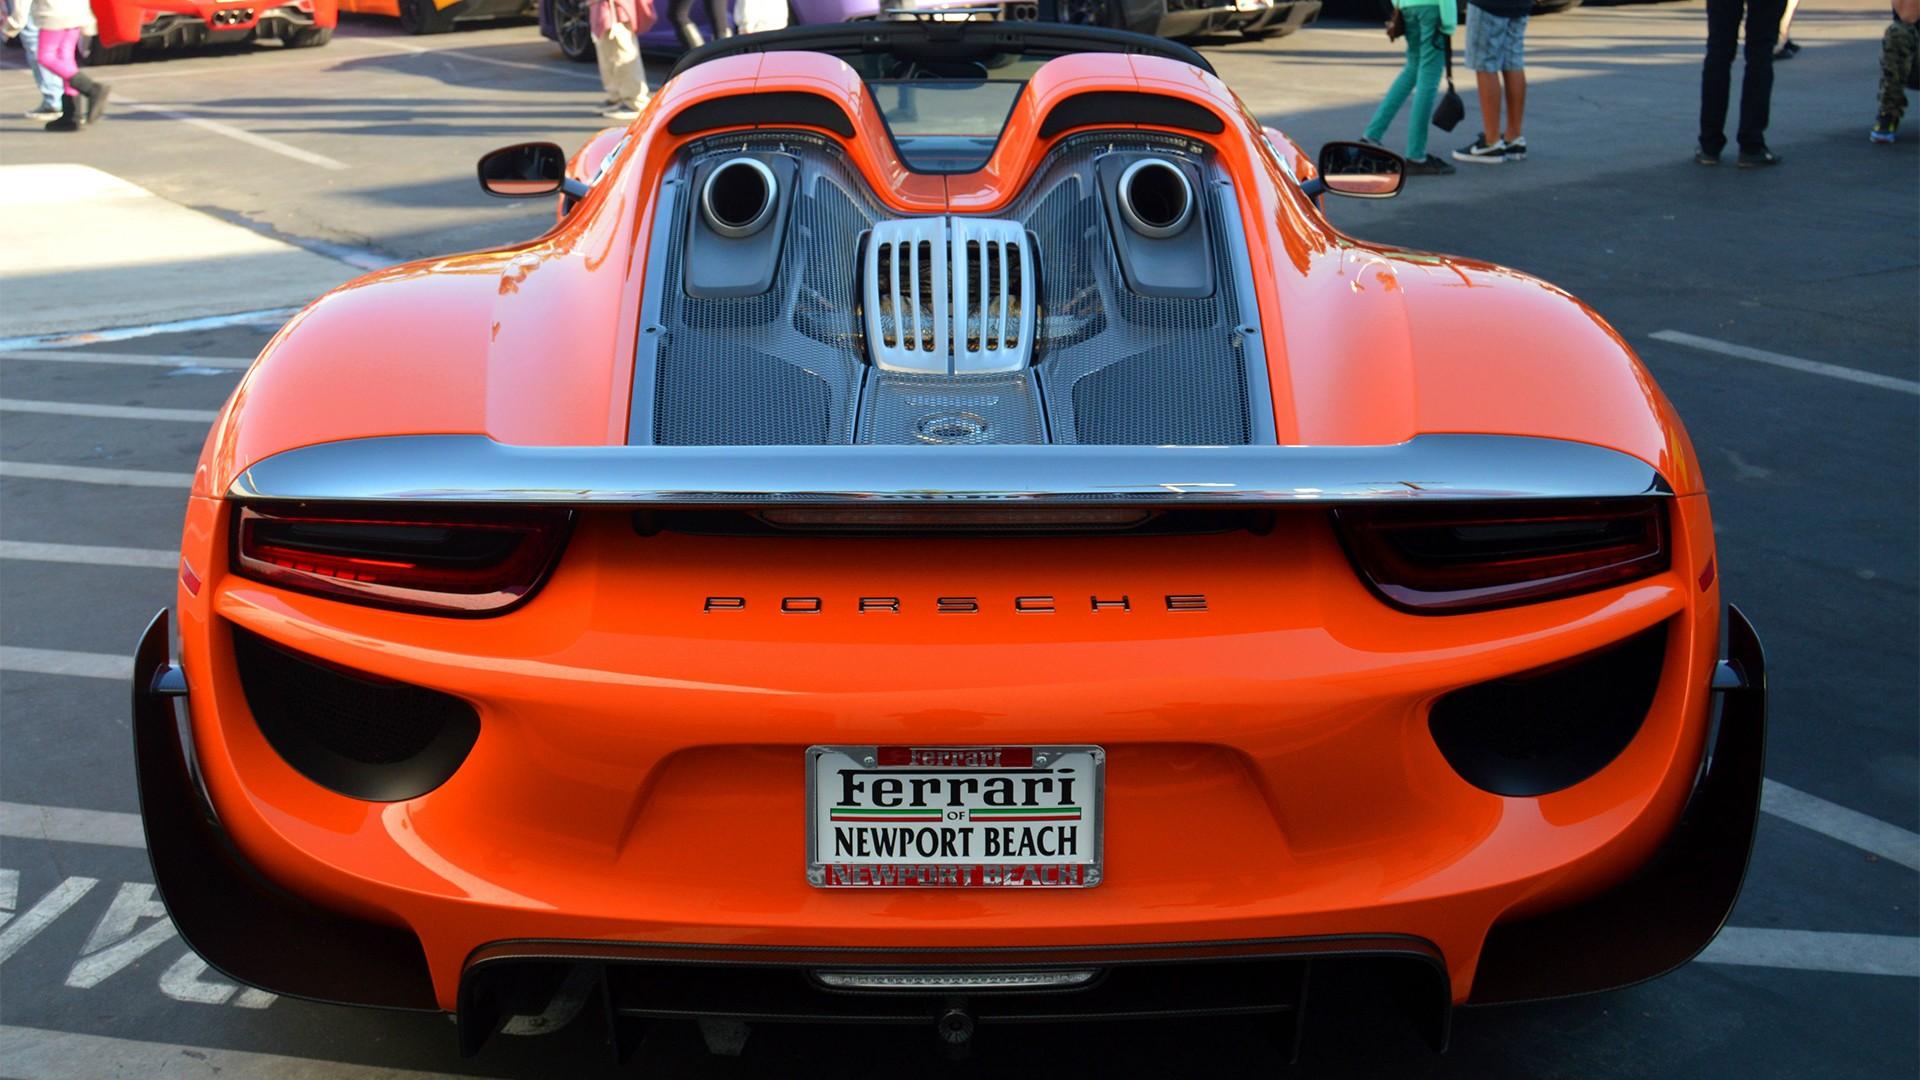 car-vehicle-Porsche-orange-sports-car-performance-car-Porsche-918-Spyder-supercar-1920x1080-px-land-vehicle-automotive-design-automobile-make-535495 Interesting Hinh Anh Xe Porsche 918 Spyder Cars Trend